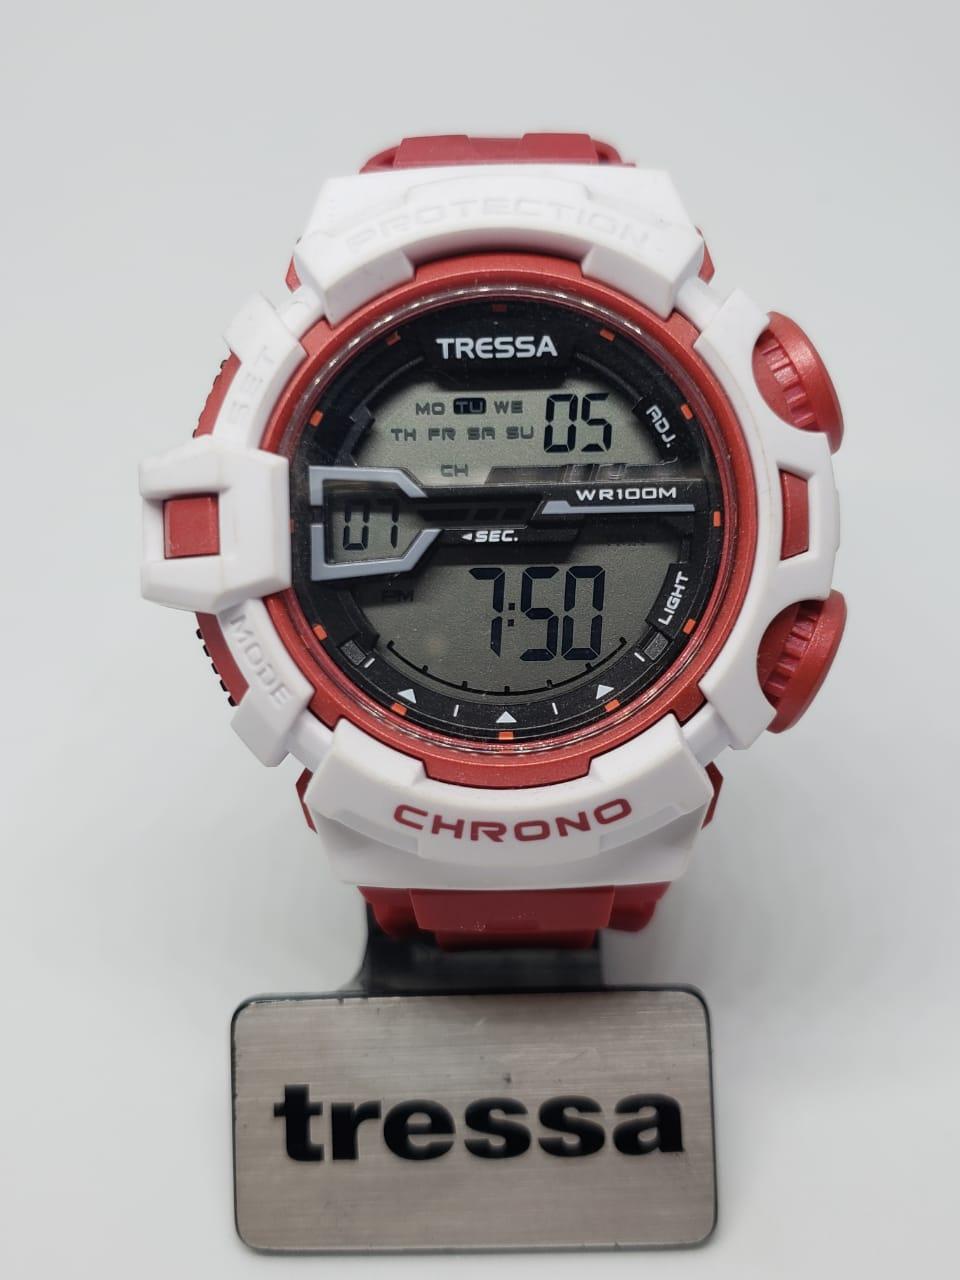 nueva llegada 83096 f6531 Reloj Tressa Digital Caballero Sumergible